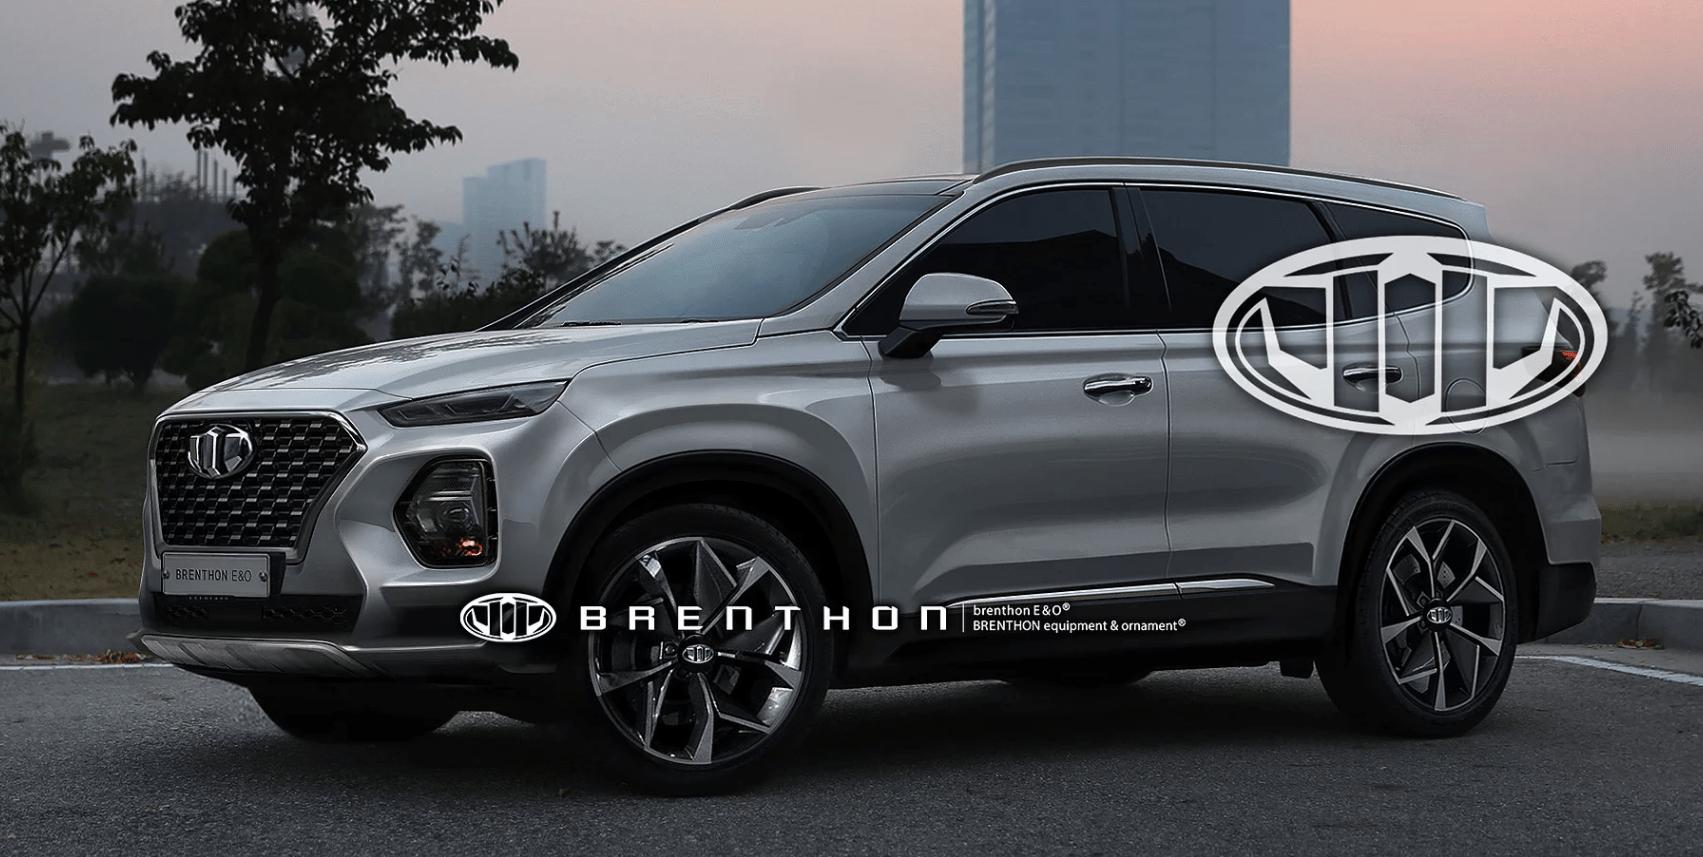 47 New Hyundai Santa Fe 2020 Research New for Hyundai Santa Fe 2020